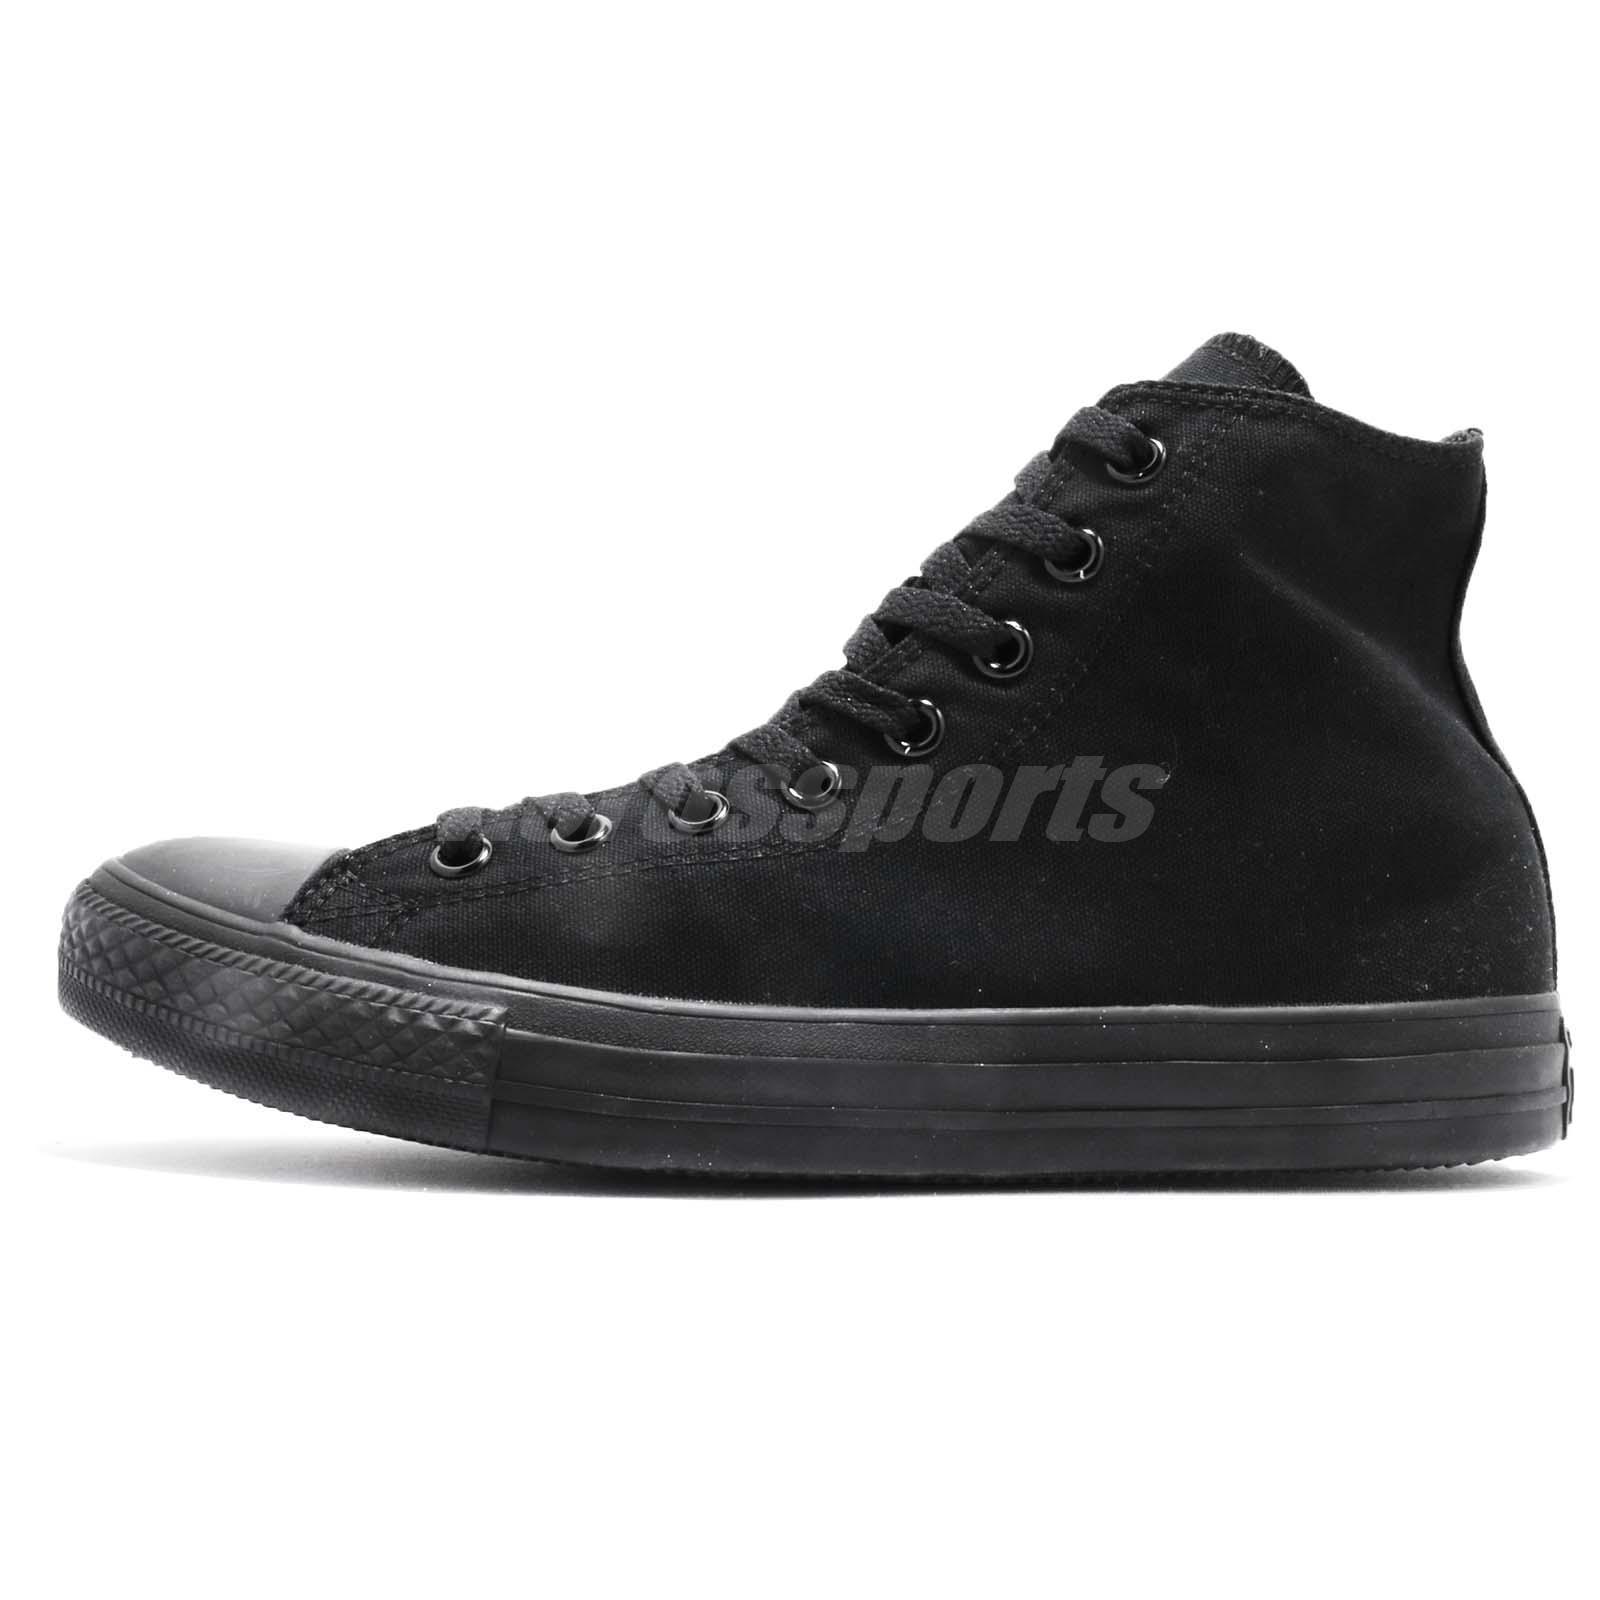 a3e90ace2c6 Converse Chuck Taylor All Star Hi Blackout 2014 New Classic Casual Shoes  M3310C